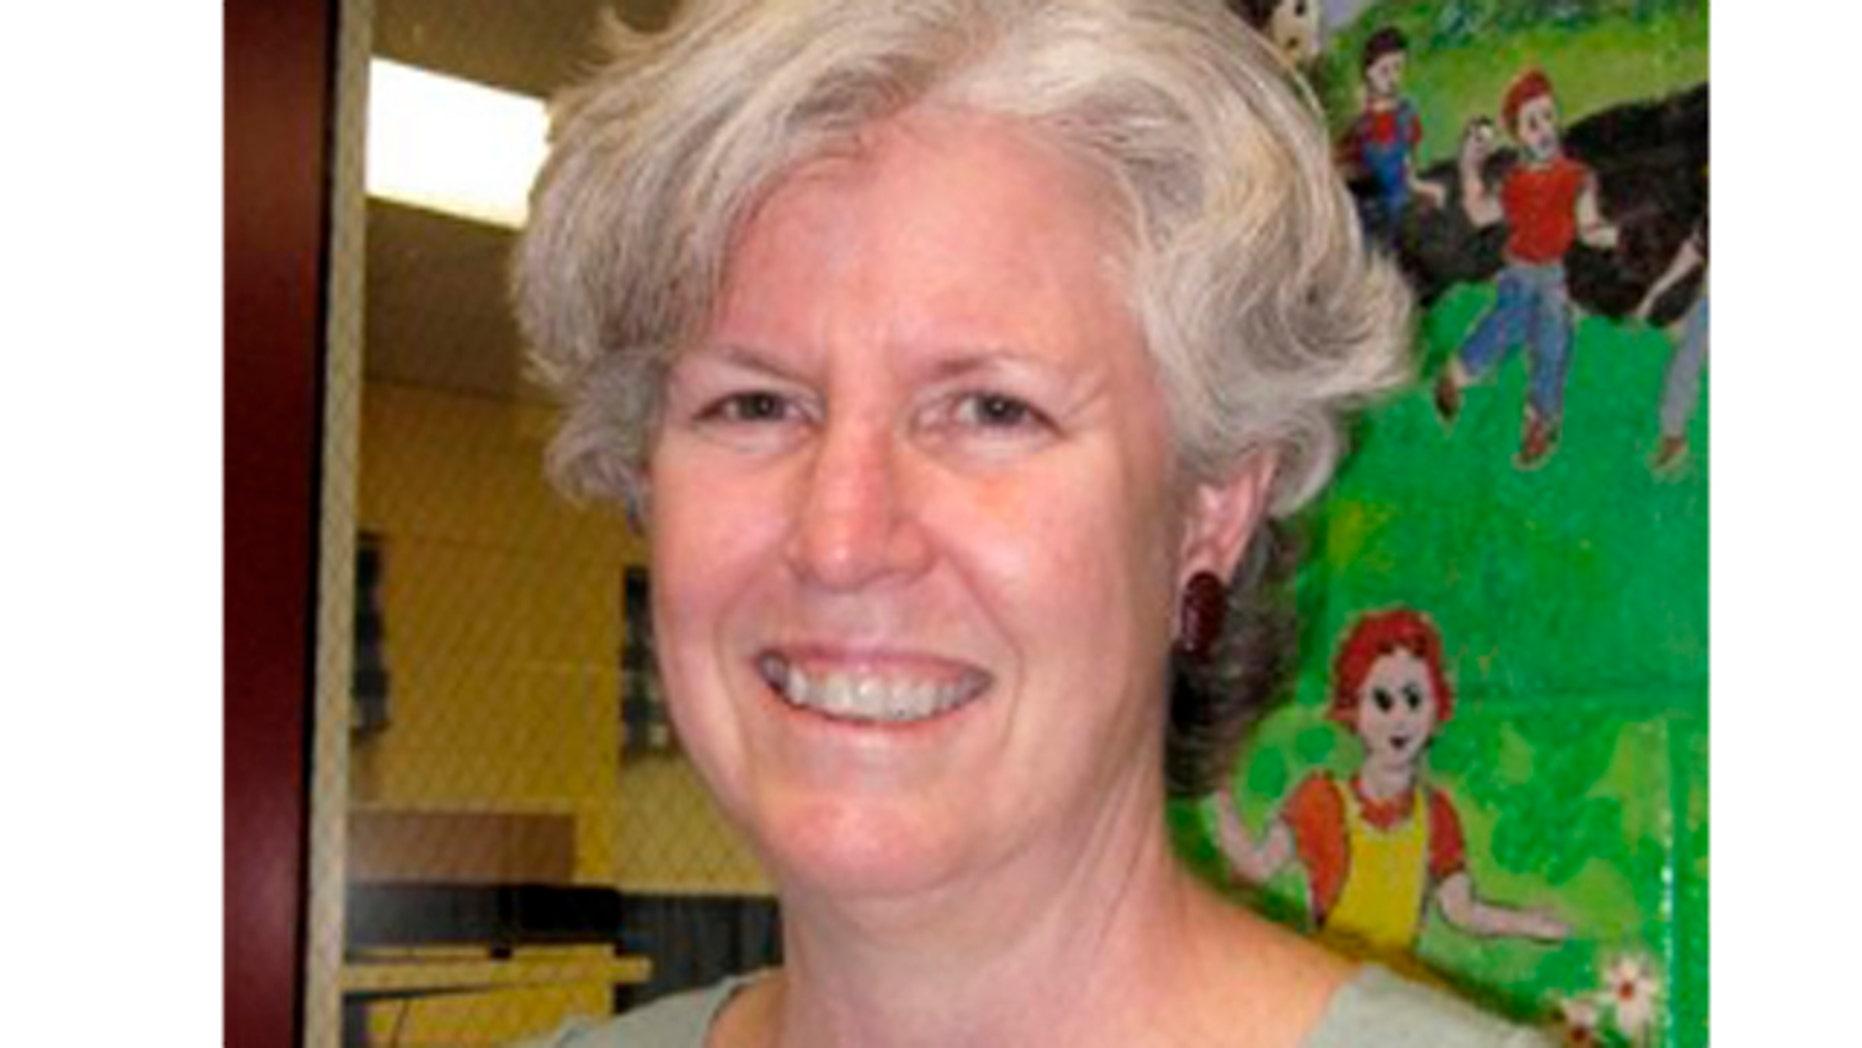 Jan. 26, 2012: Pictured is Elementary School Principal Gwen Rhodes in Rochester, N.H..